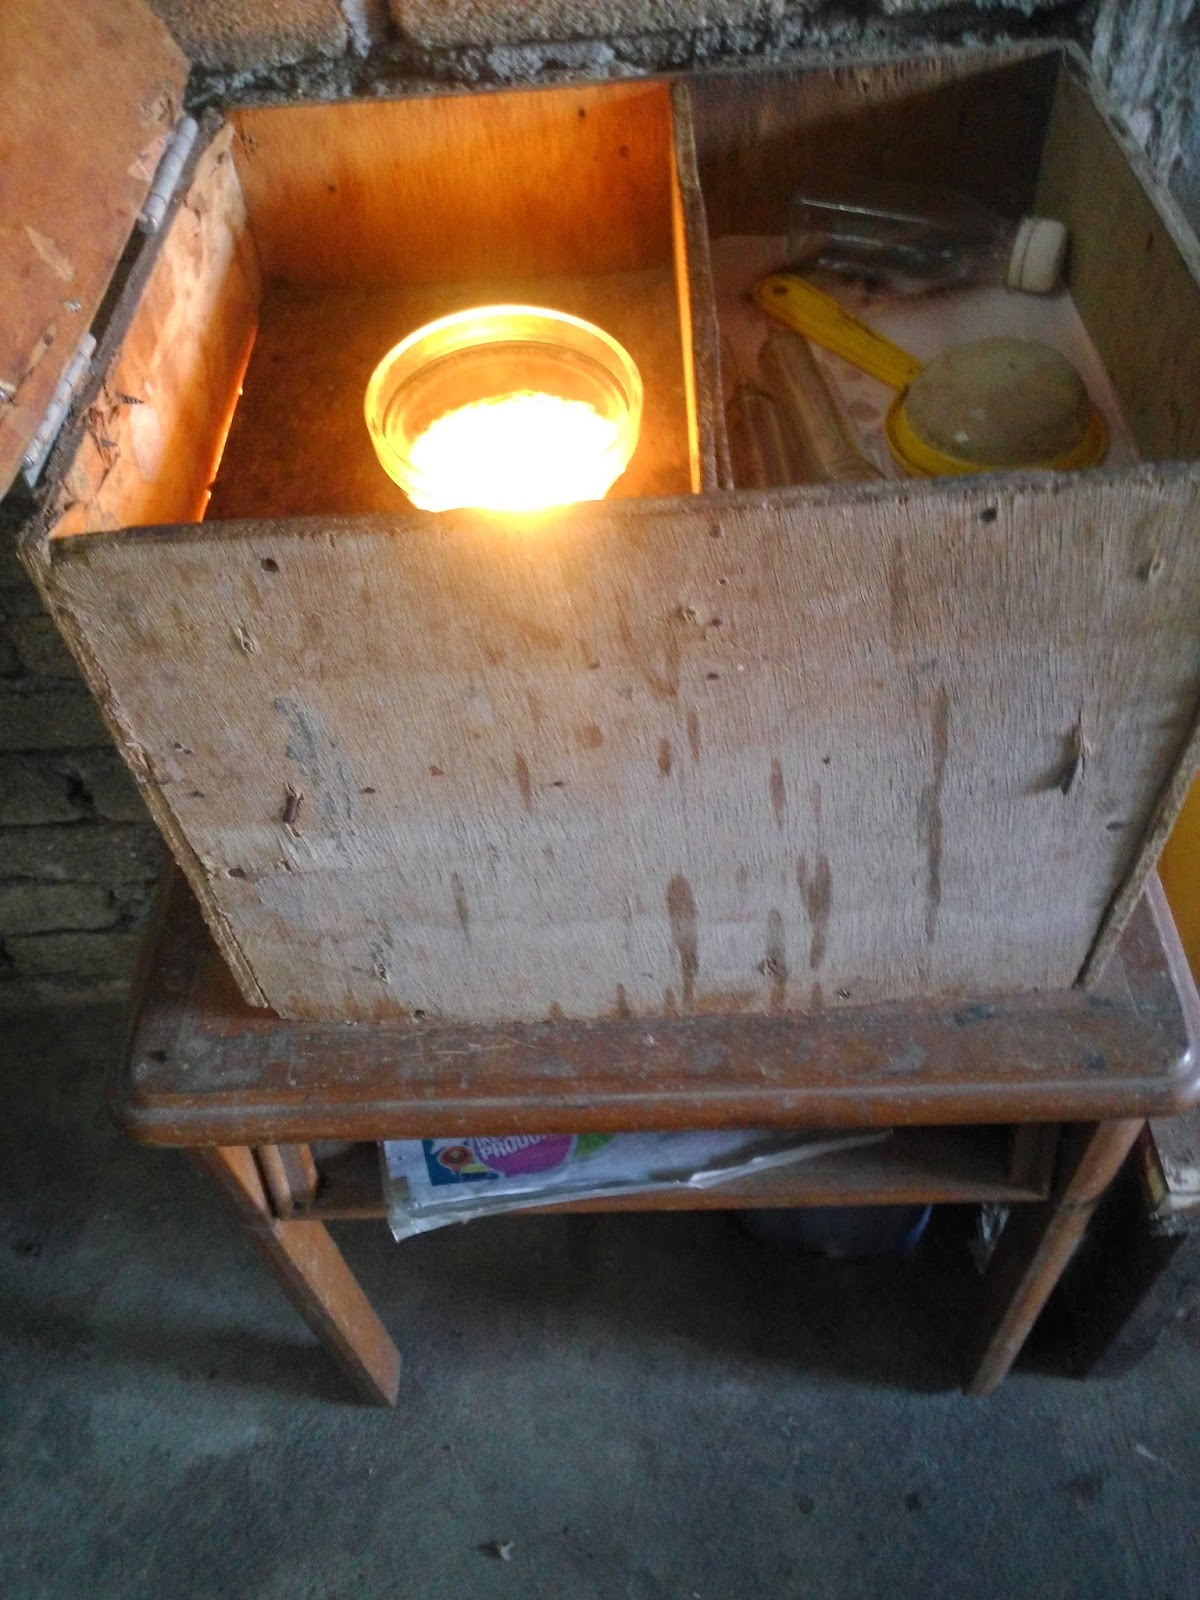 6 Minyak Yang Telah Luarkan Daripada Dapur Akan Dipanaskan Menggunakan Lampu Bagi Memudahkan Proses Mengasingkan Gaharu Dan Air